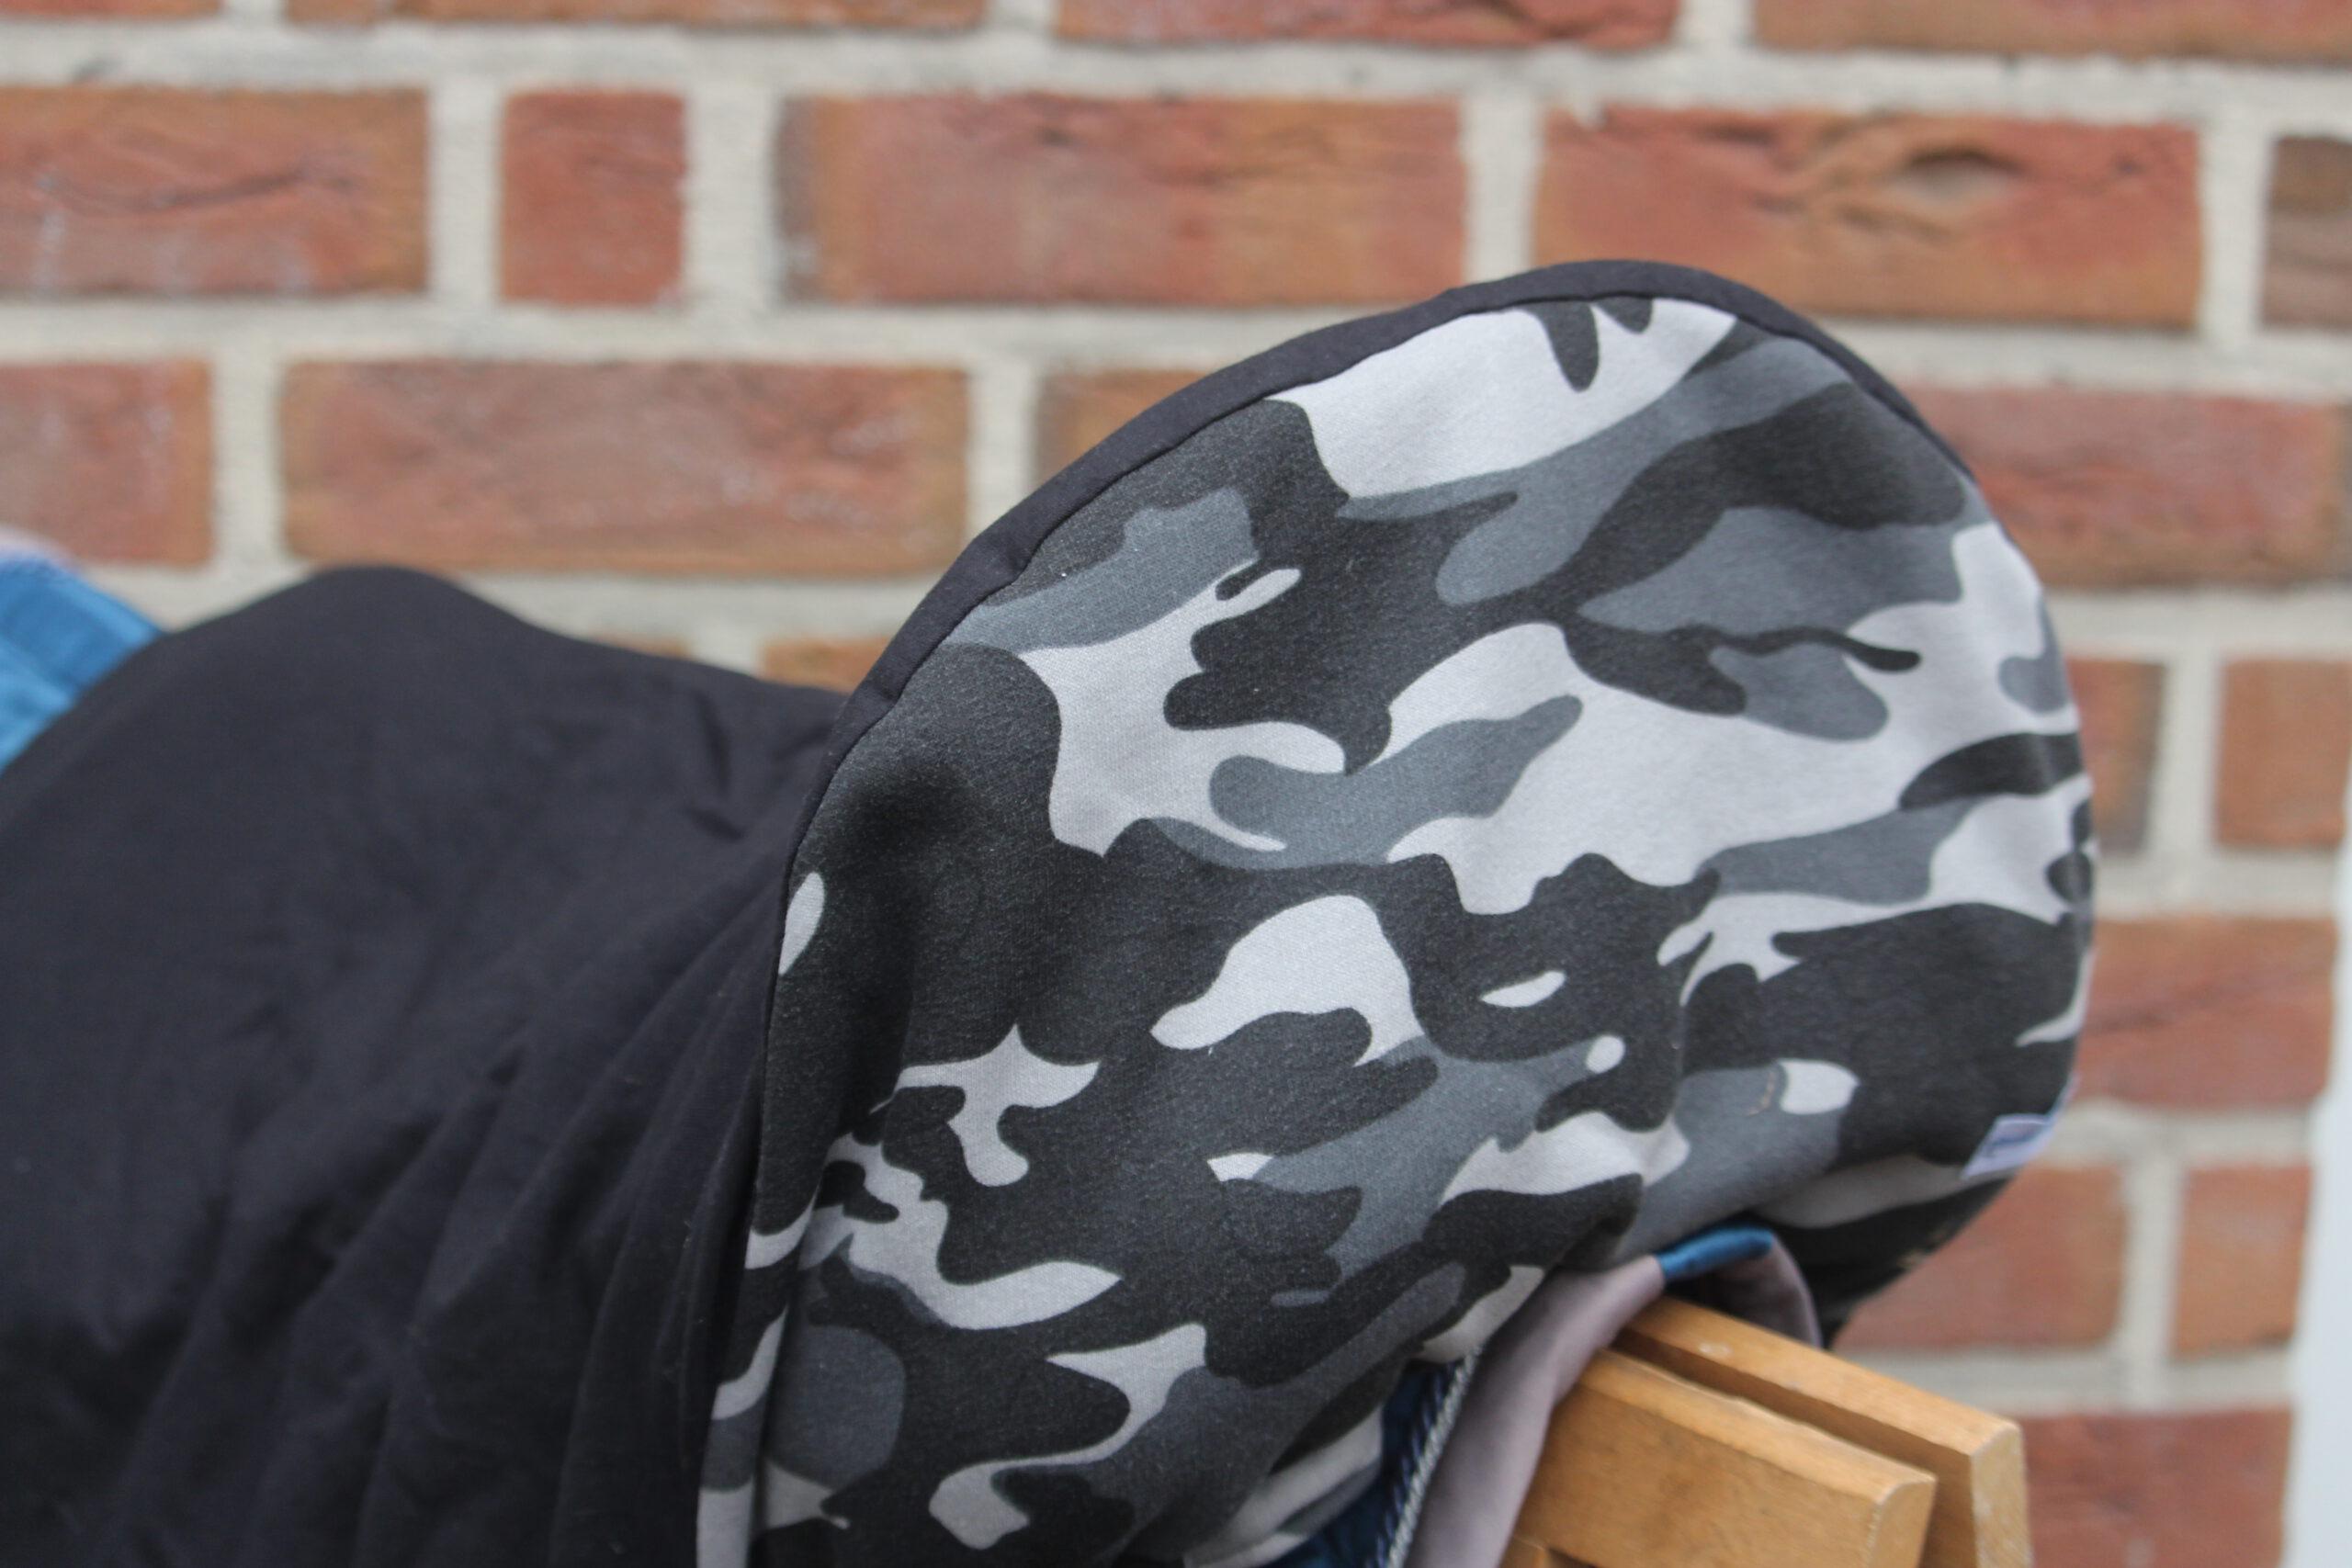 Sattelschoner Camouflage